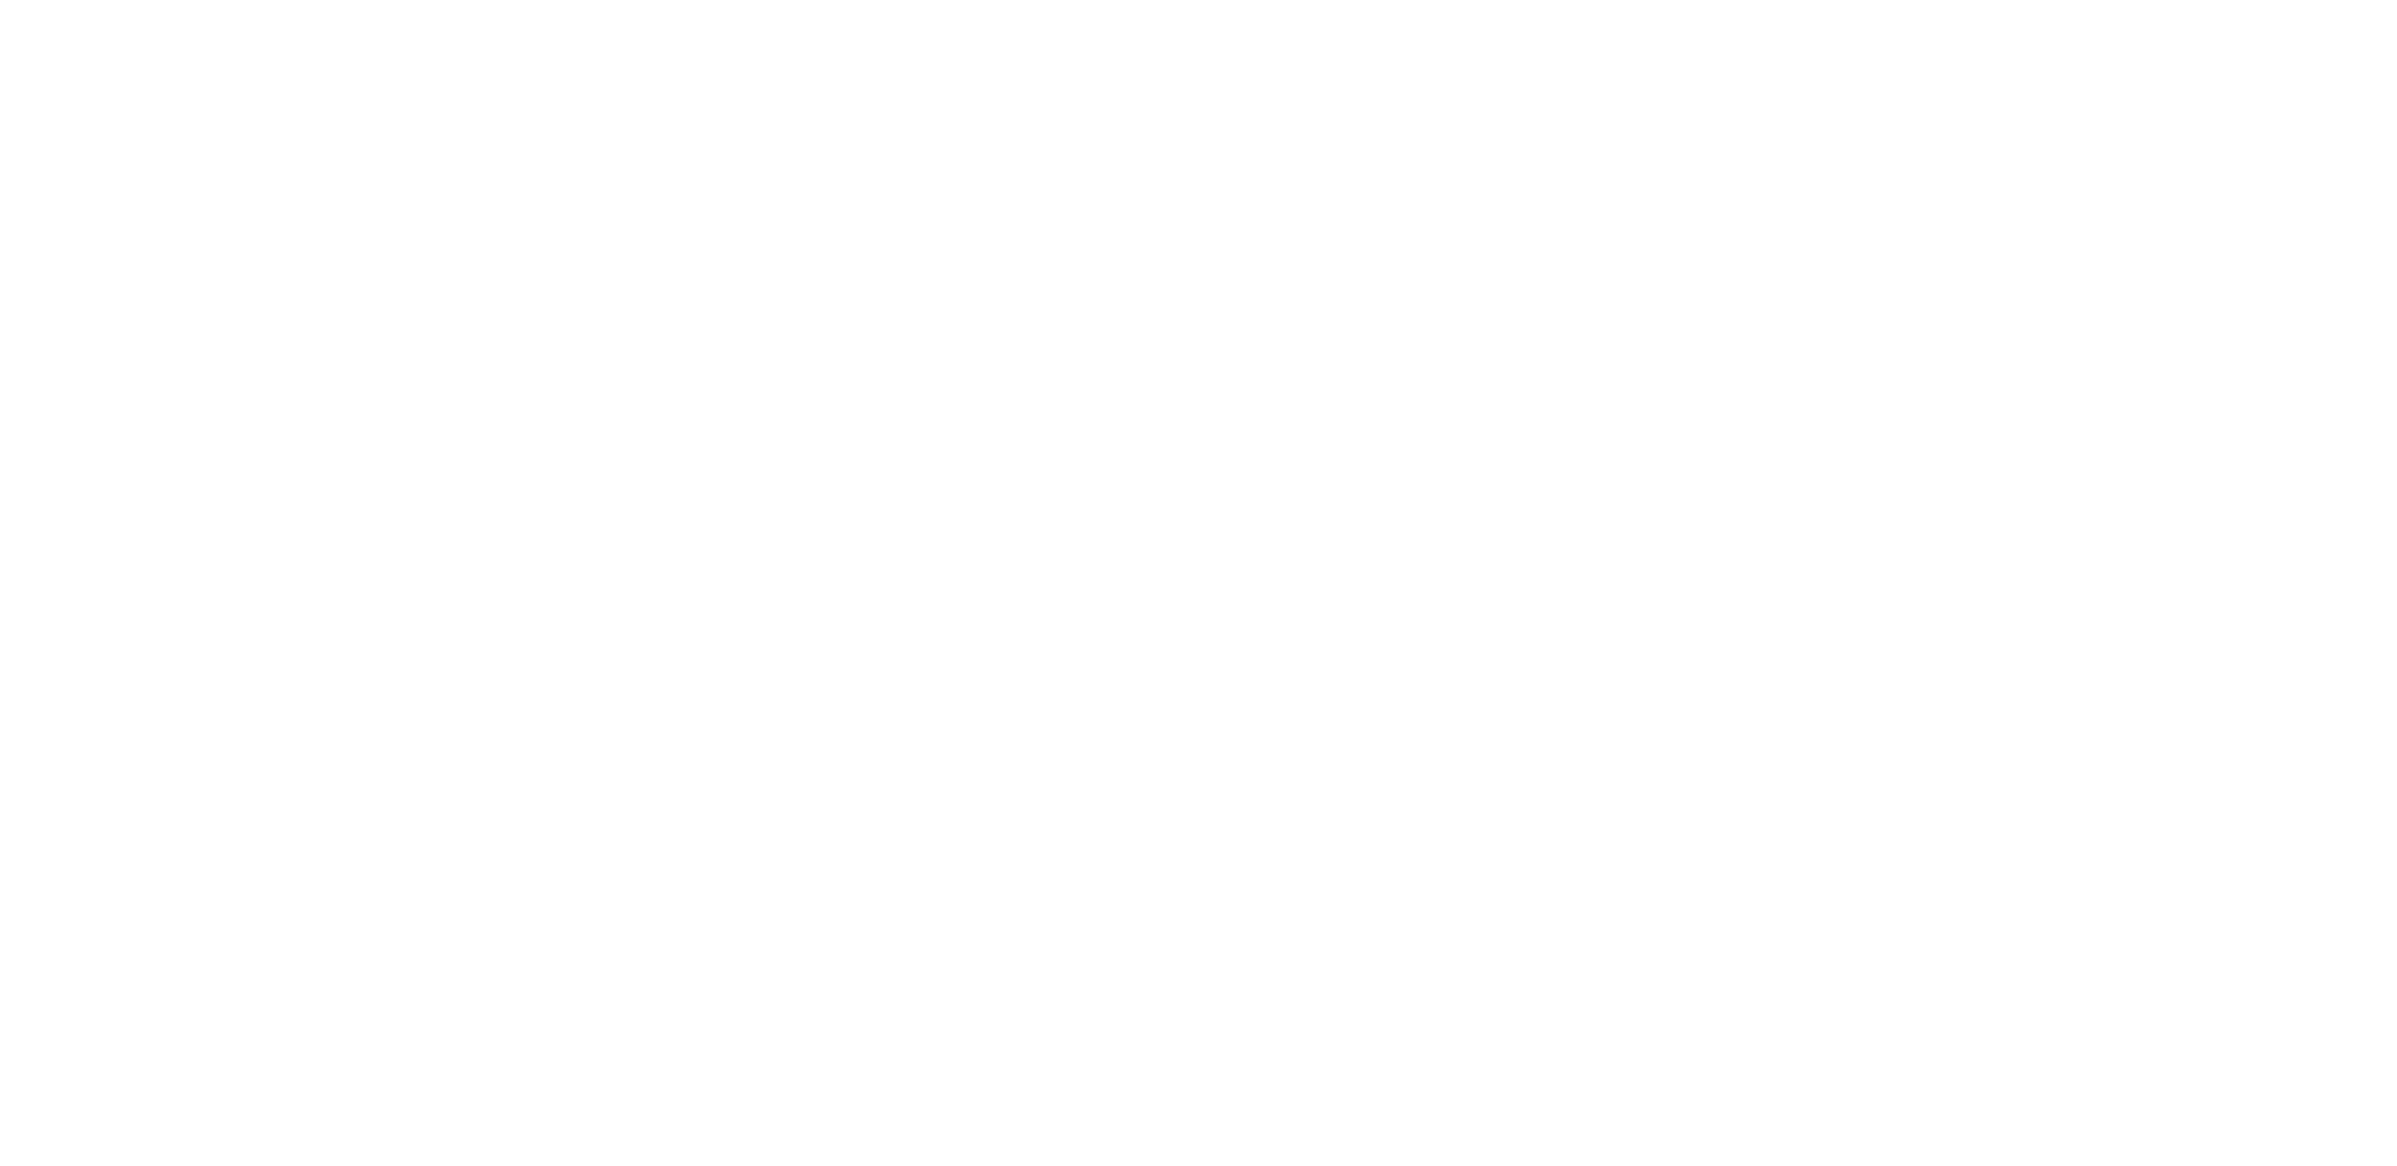 02_logo_white.png